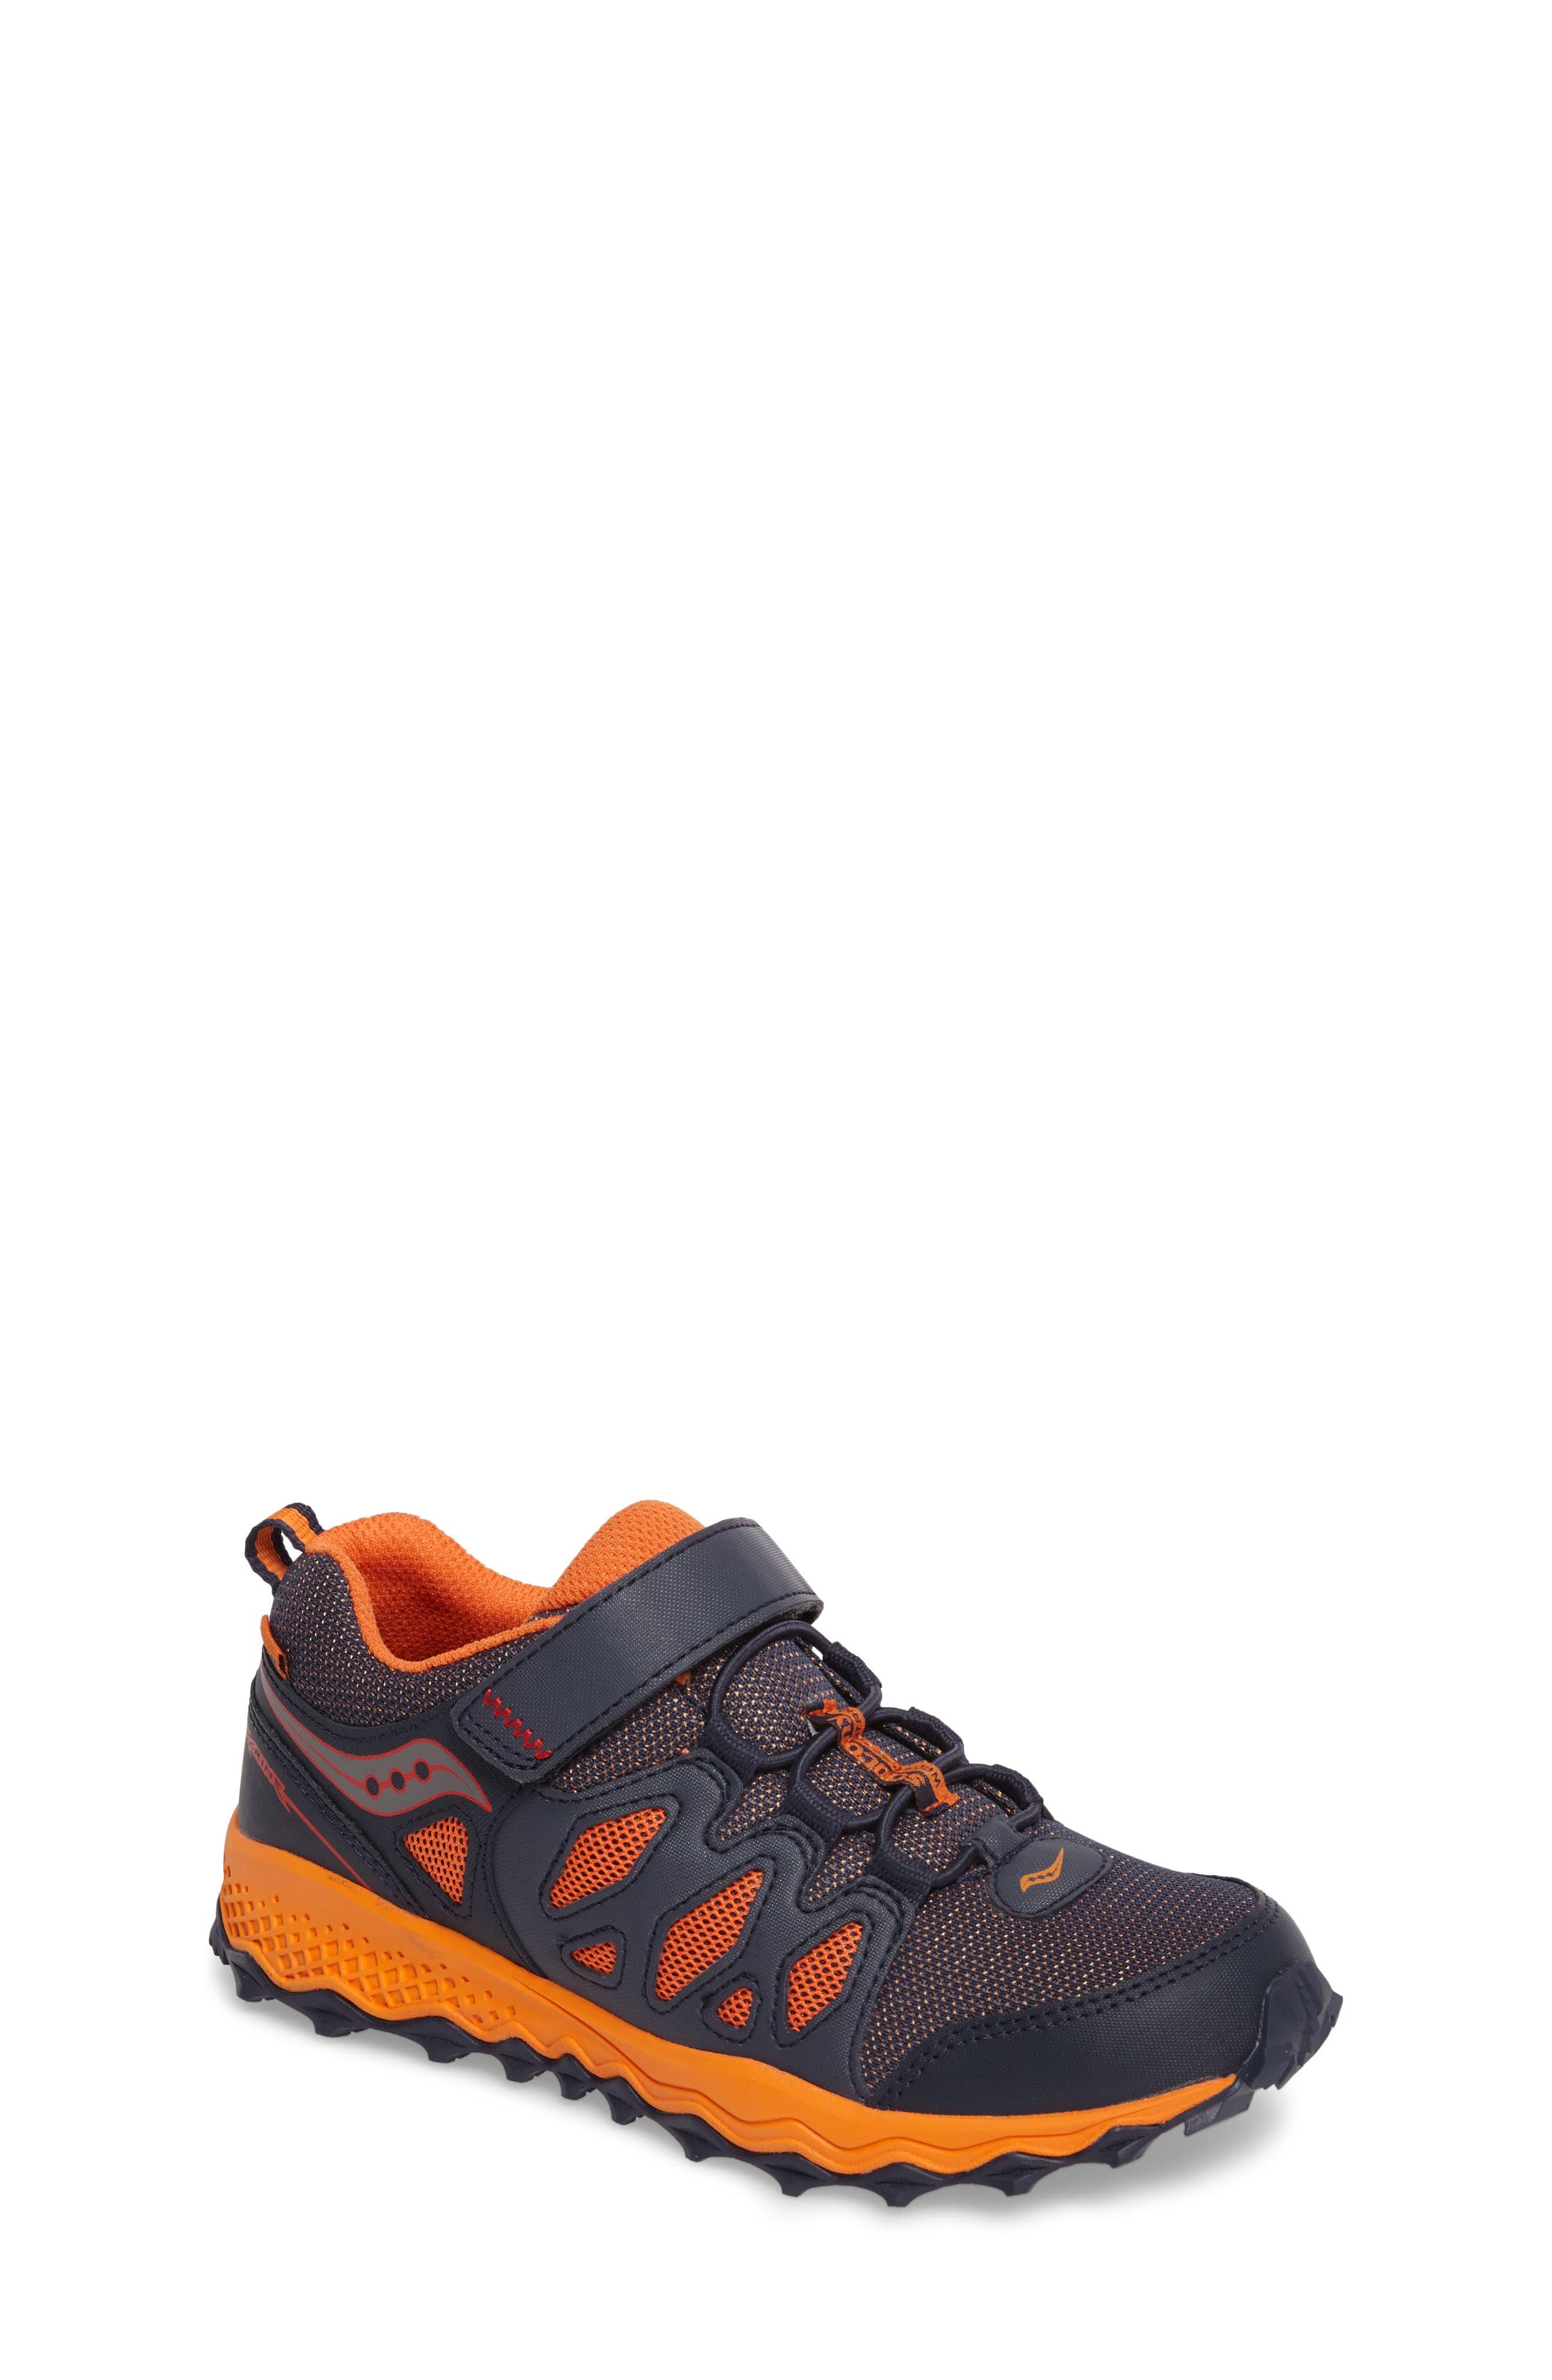 Peregrine Shield Water-Resistant Sneaker,                         Main,                         color, Navy/ Orange